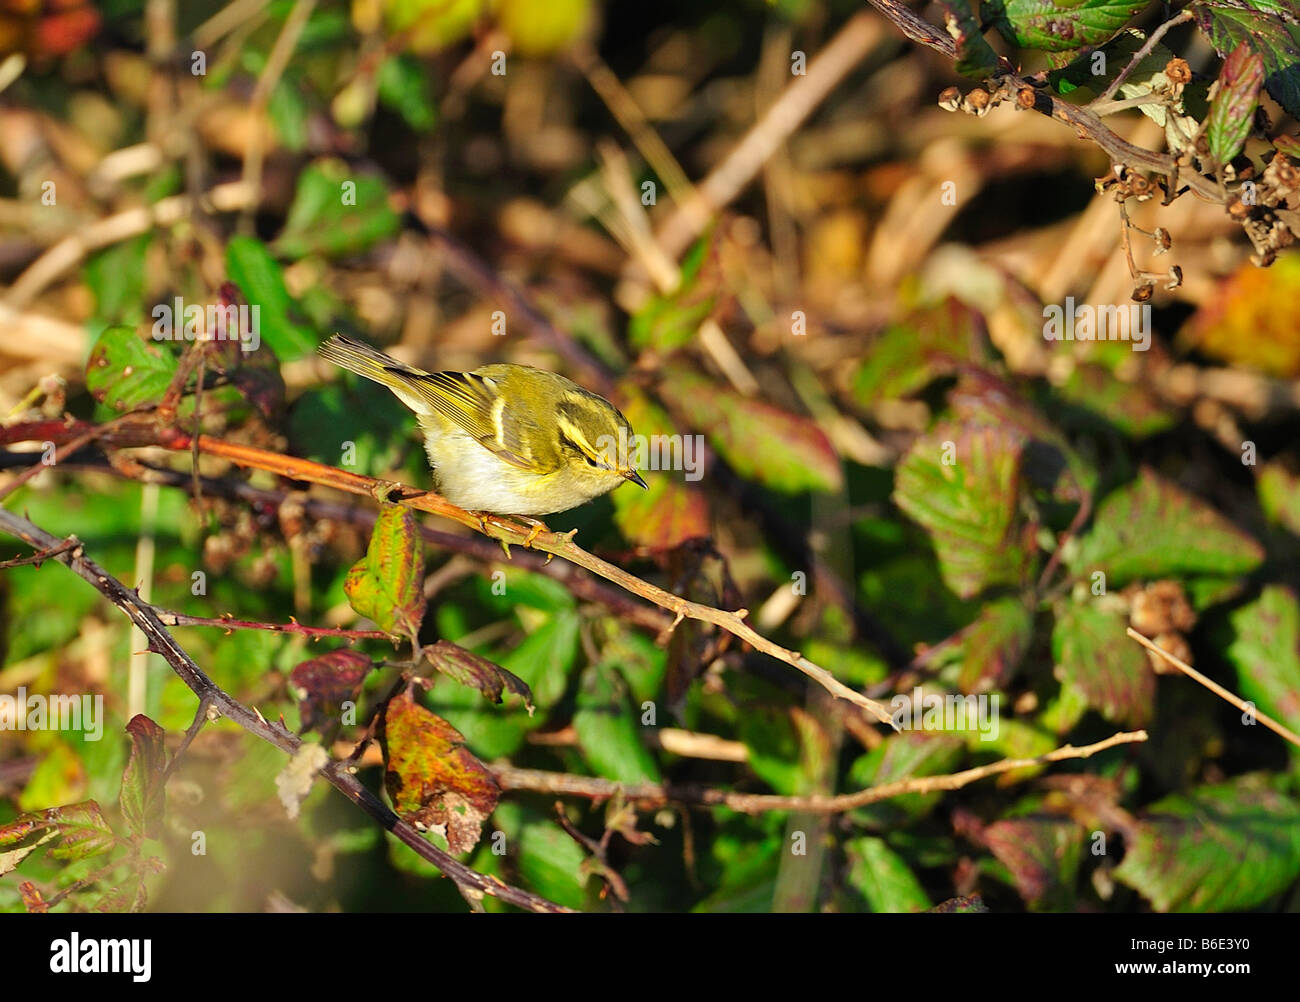 Pallas's Warbler. Phylloscopus proregulus Stock Photo